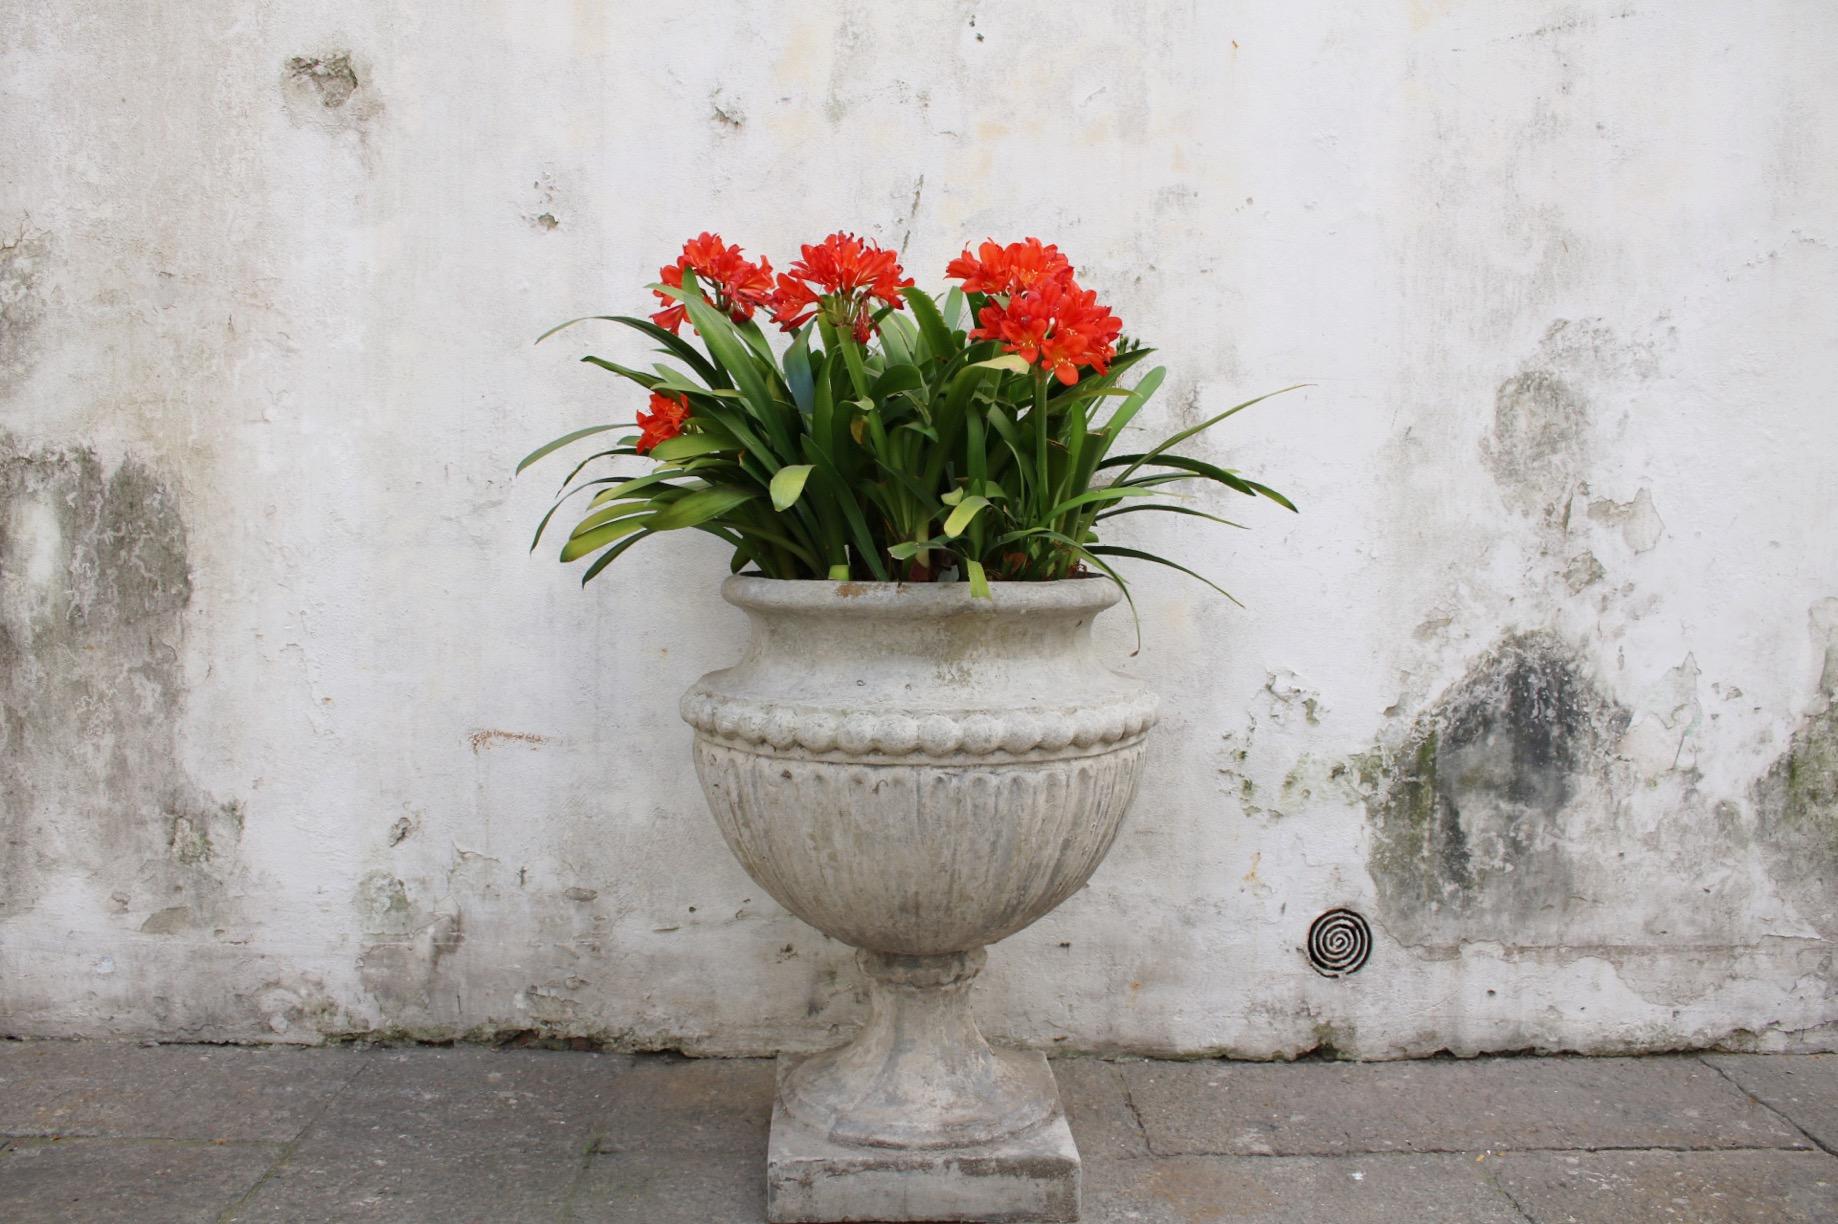 Flowers in Montevideo